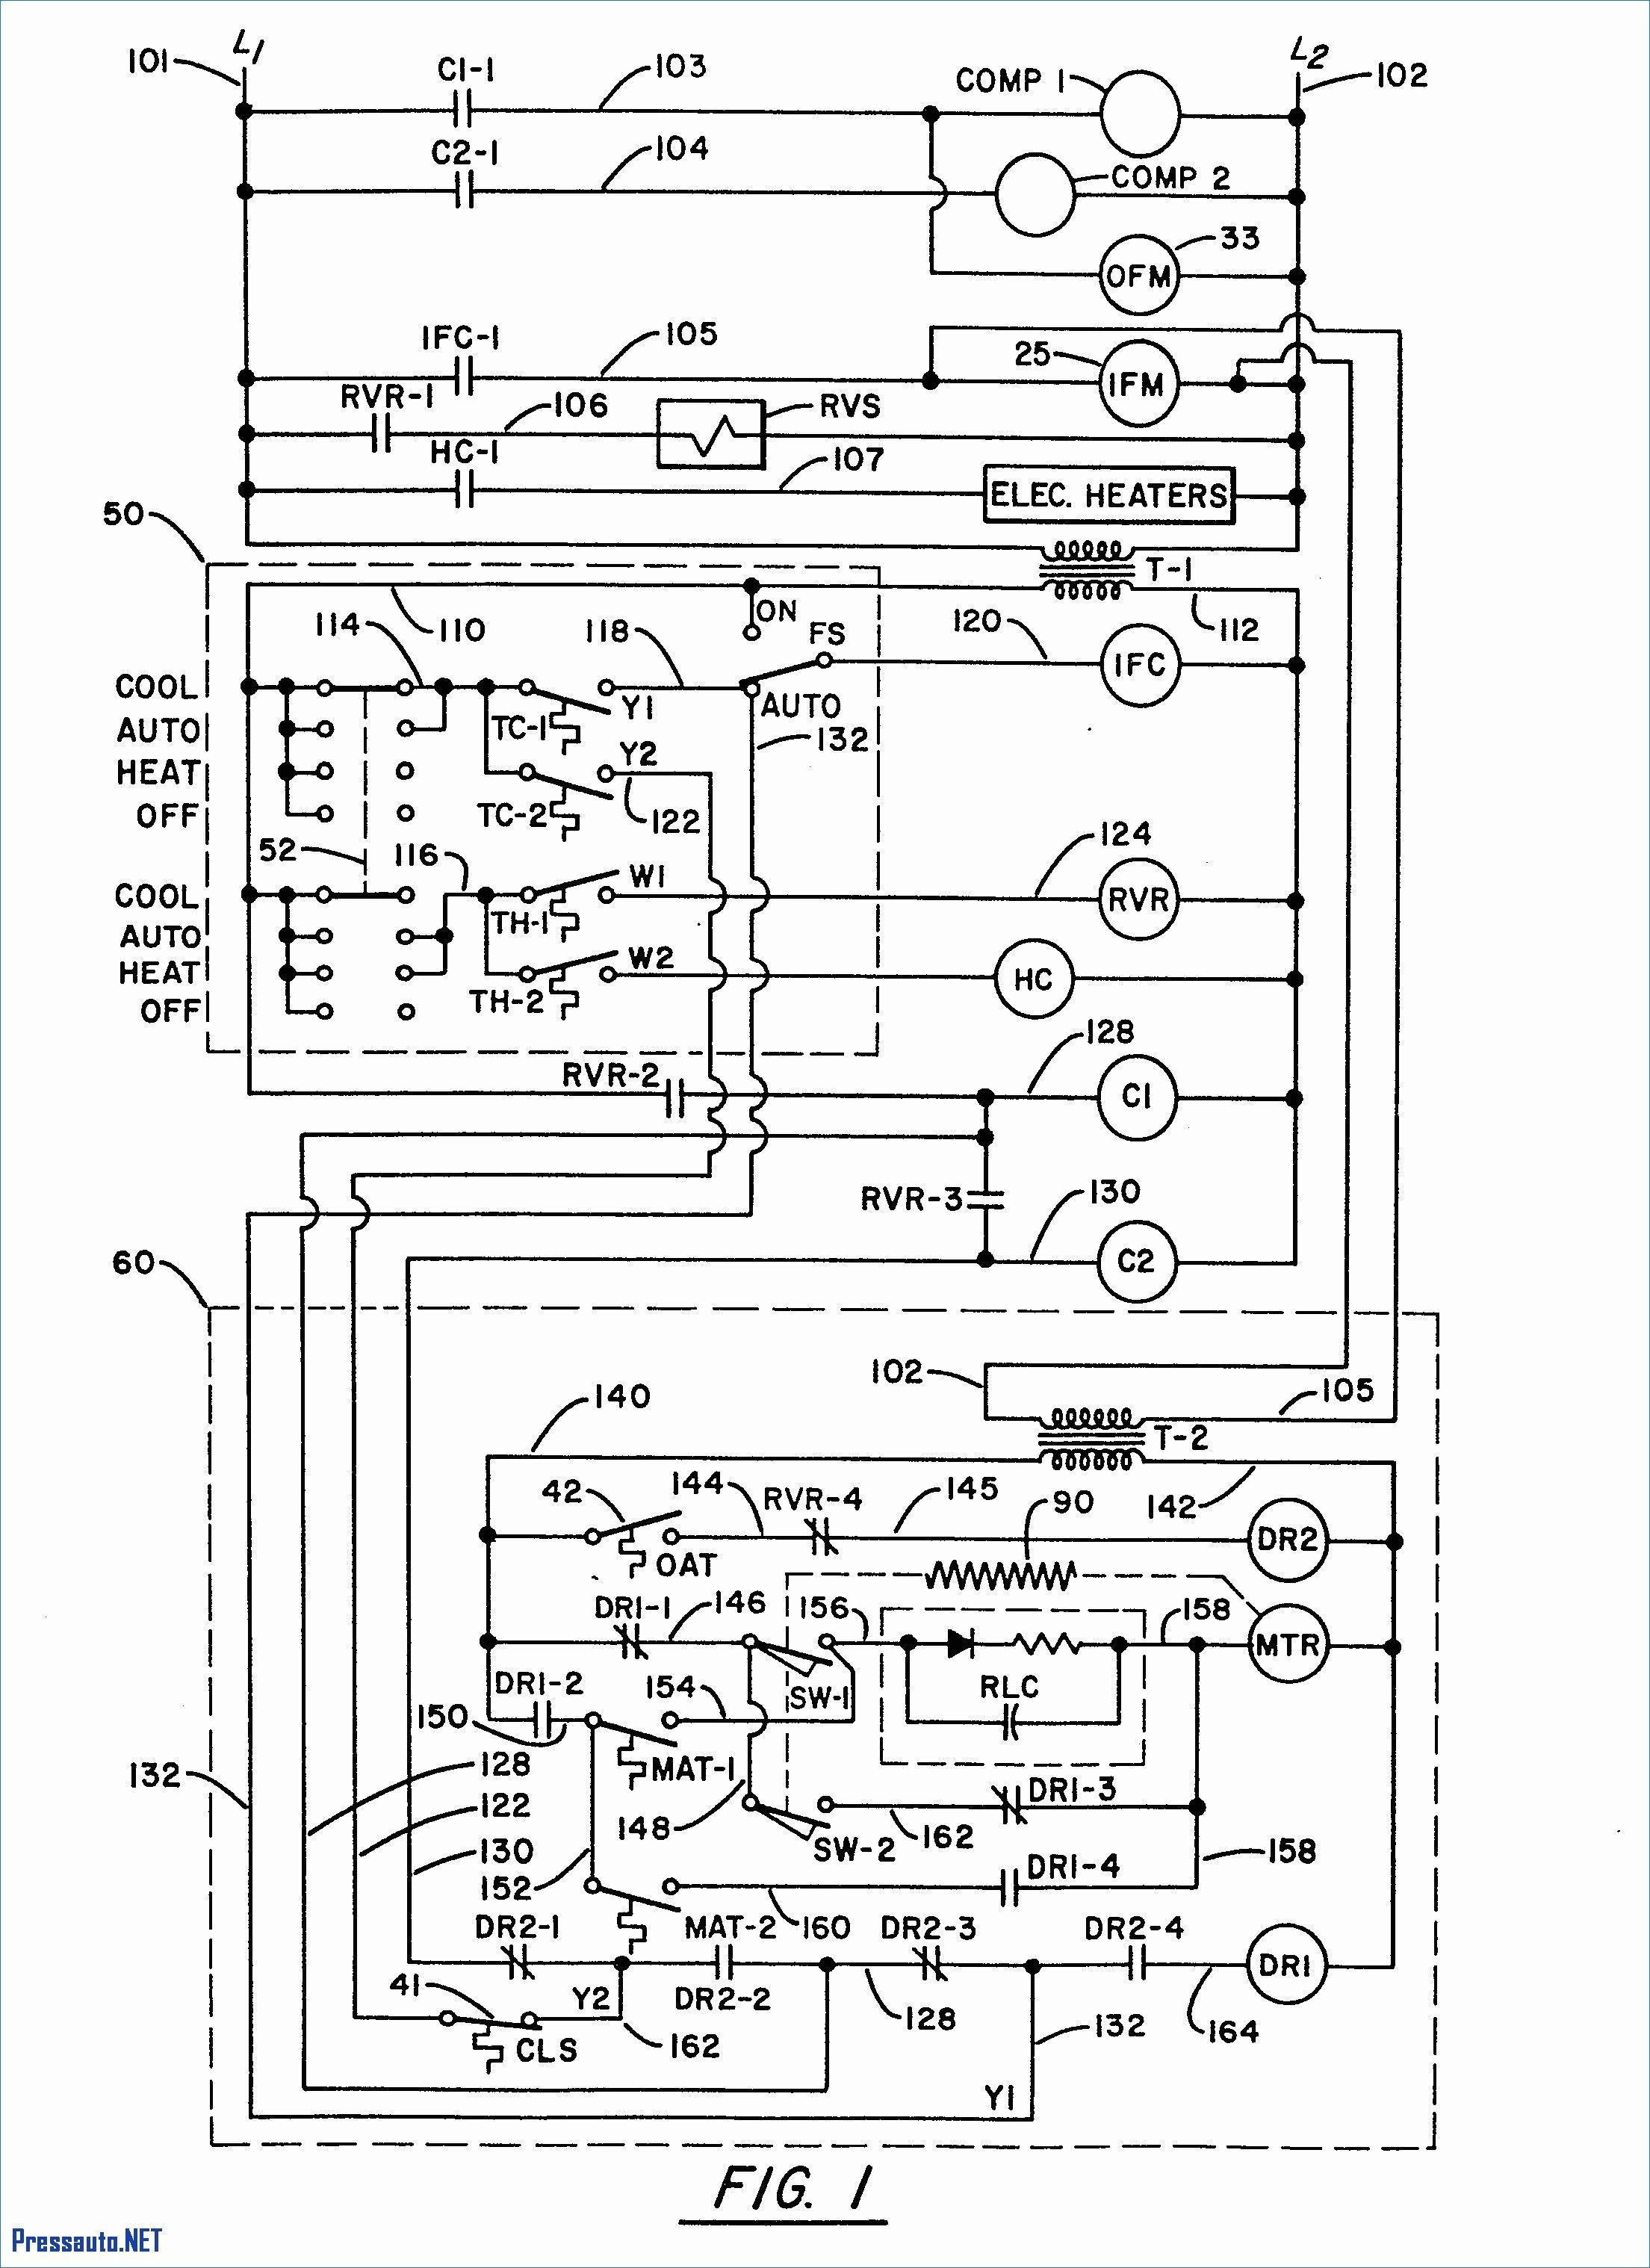 Lovely Wiring Diagram Zig Unit Diagrams Digramssample Diagramimages Wiringdiagramsample Wiringdiagram Trailer Wiring Diagram Diagram Caravan